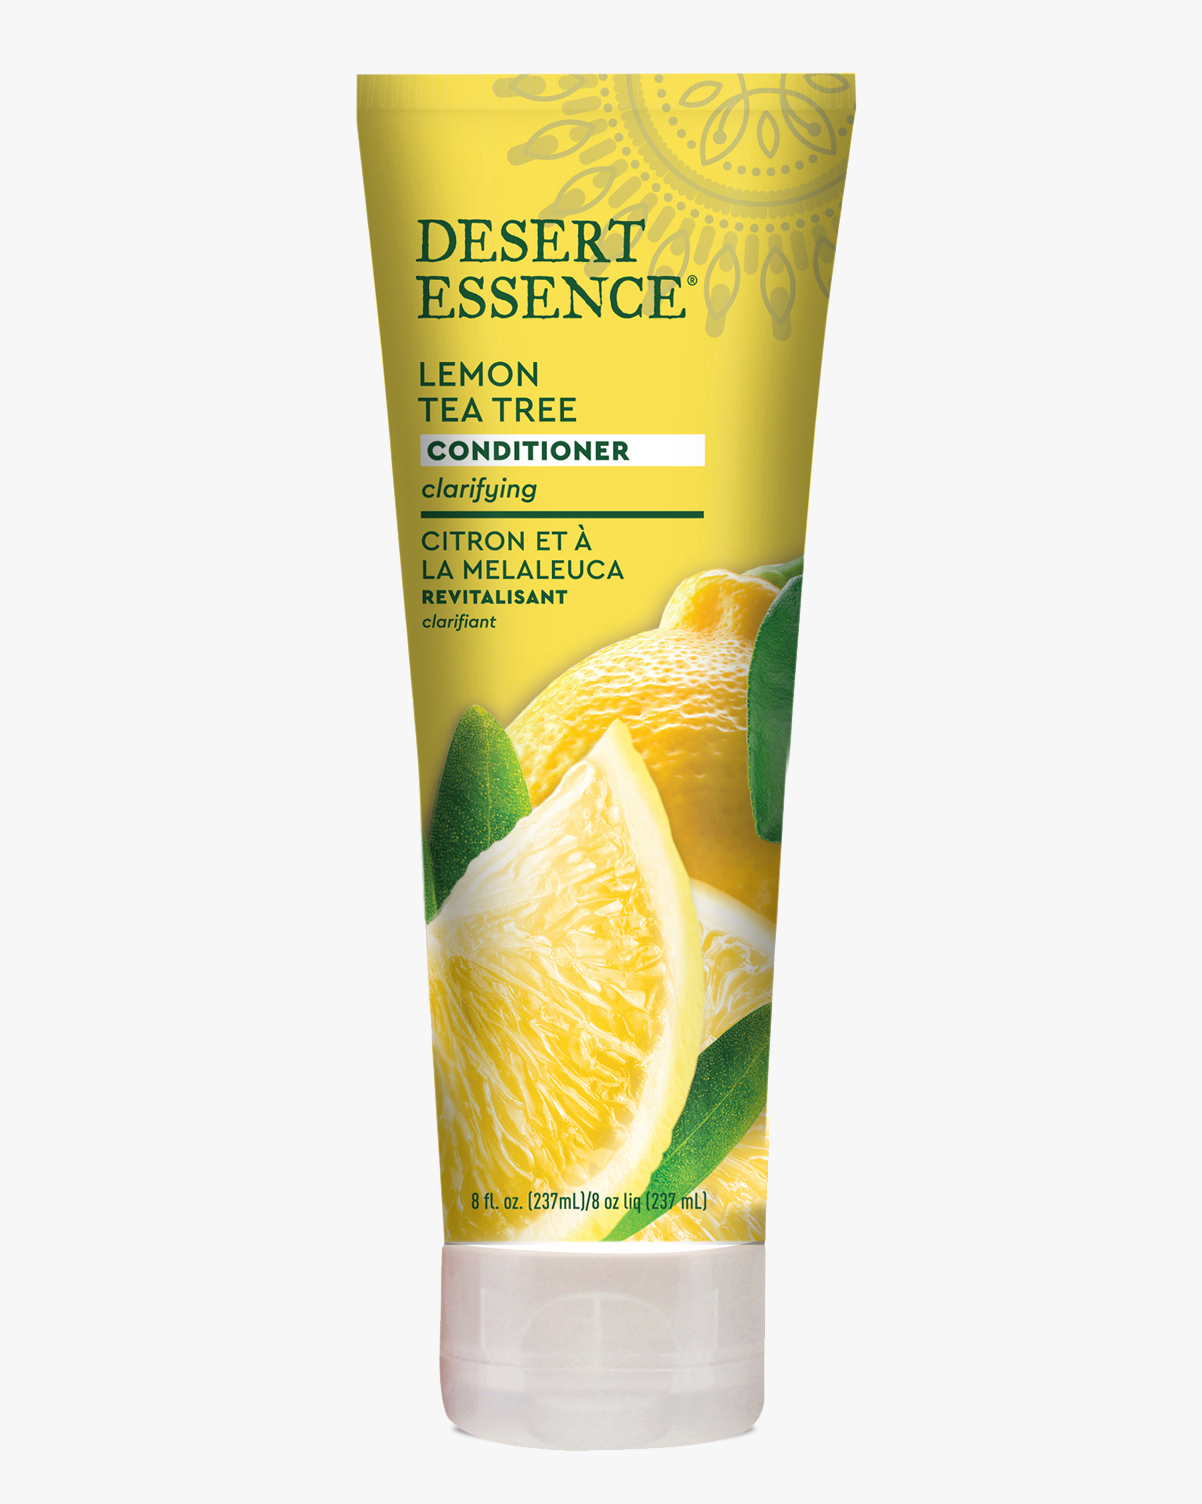 Desert Essence coupon: Desert Essence Lemon Tea Tree Conditioner, 8 fl. oz. | Vegan | Gluten-Free